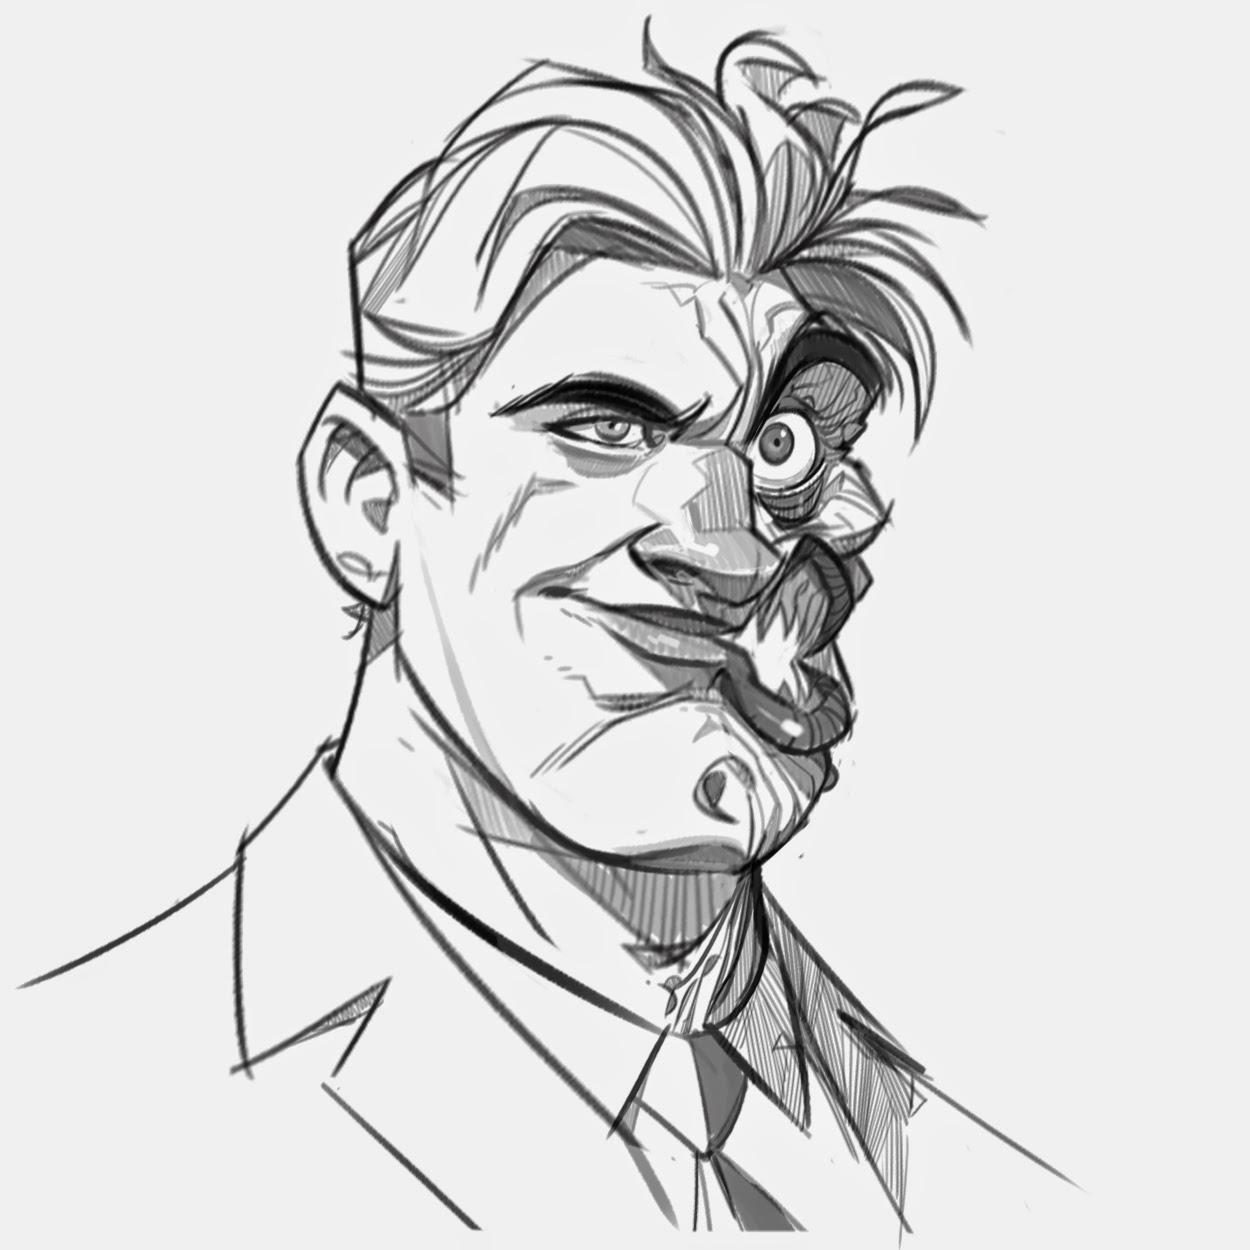 P.Cohen Sketch Blog: Two-Face